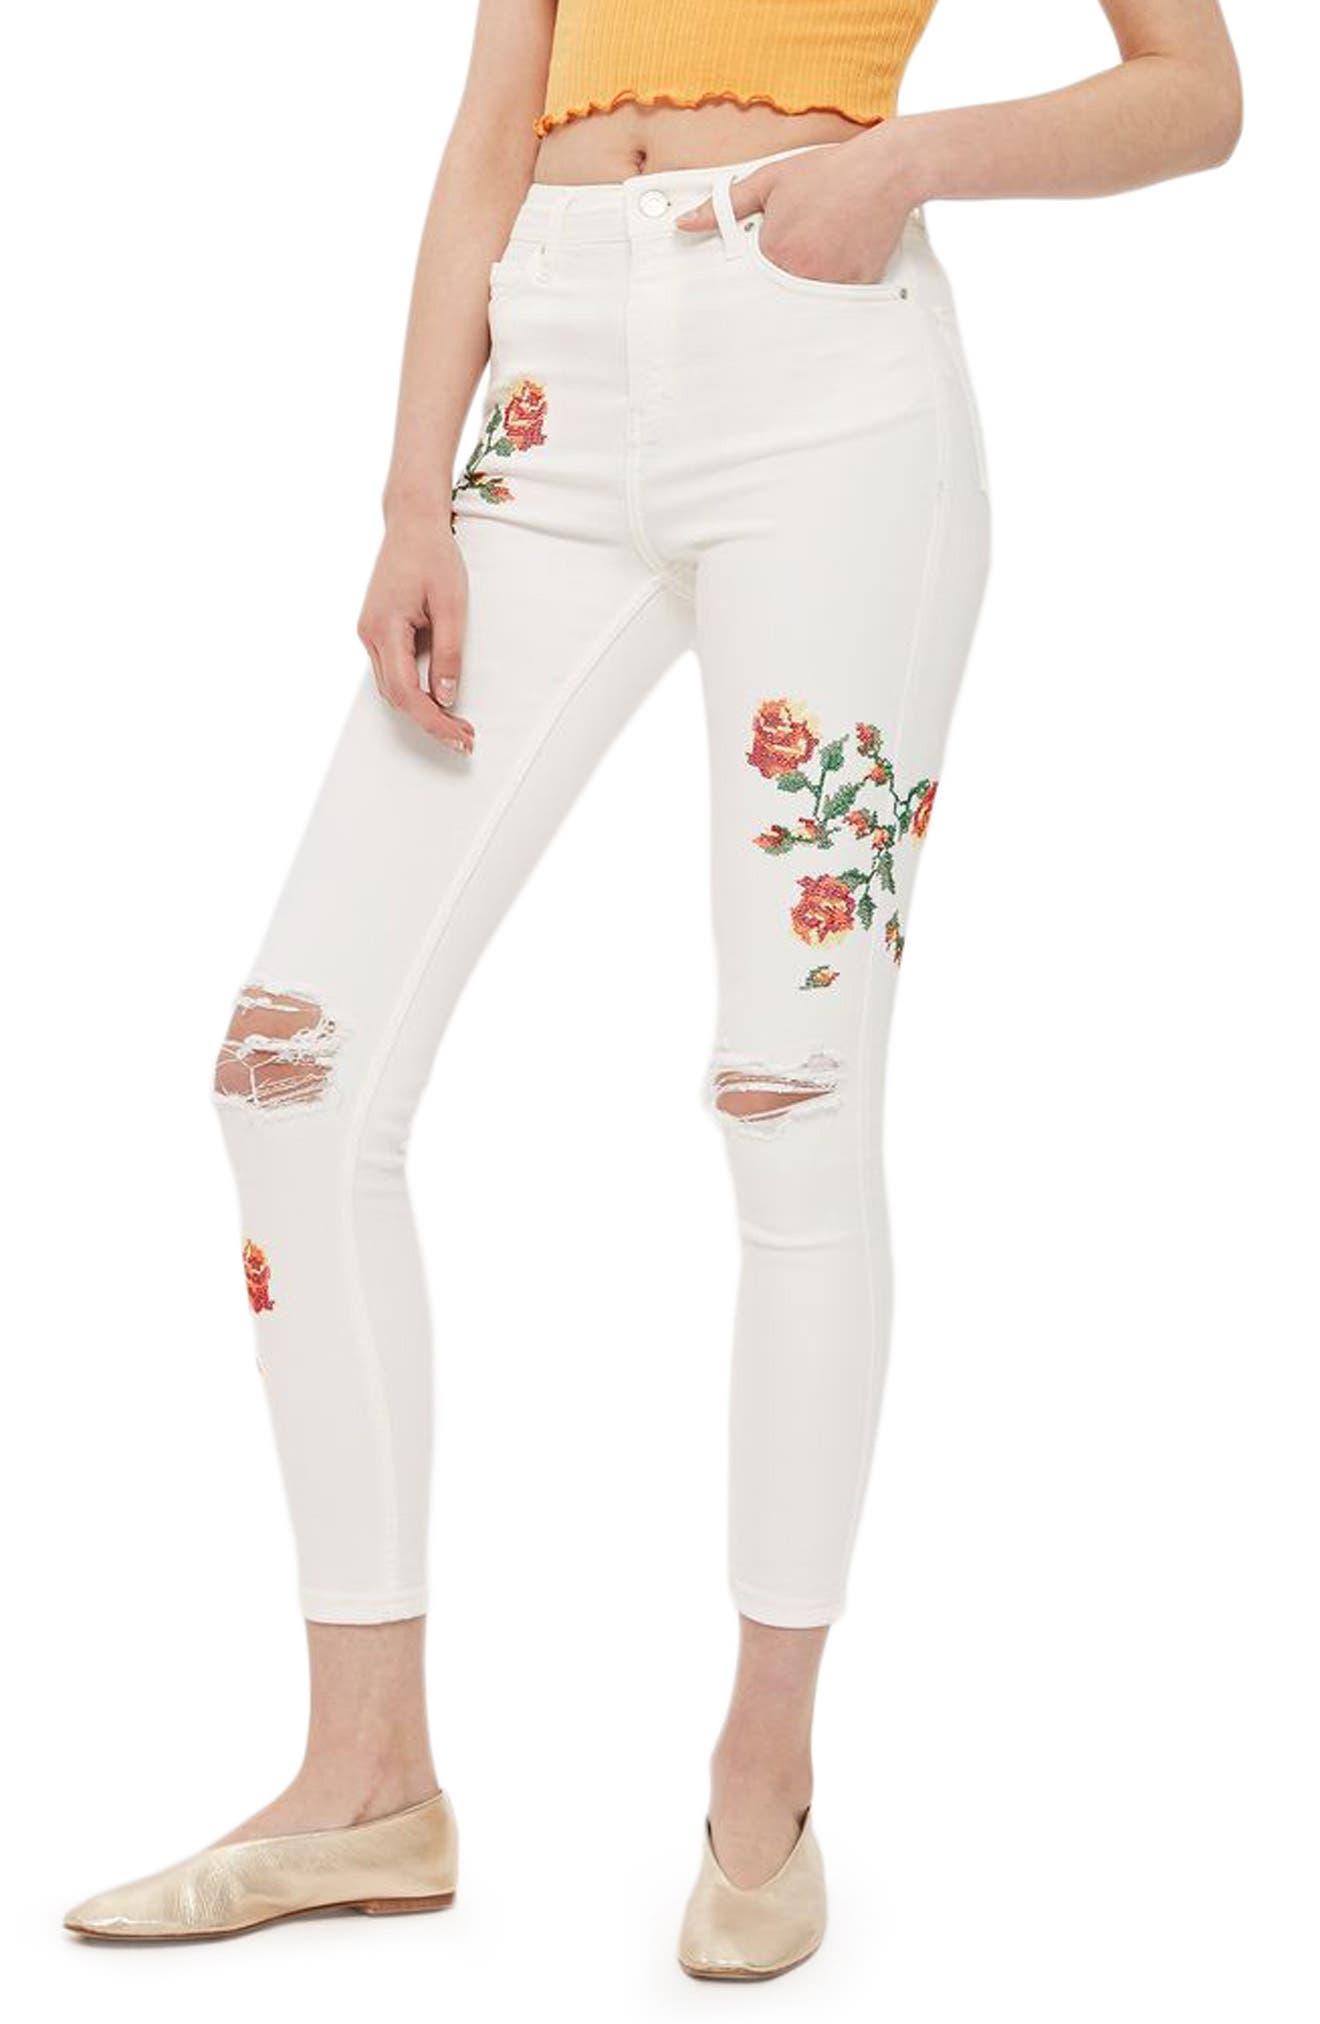 Main Image - Topshop Jamie Embroidered Skinny Jeans (Regular & Petite)